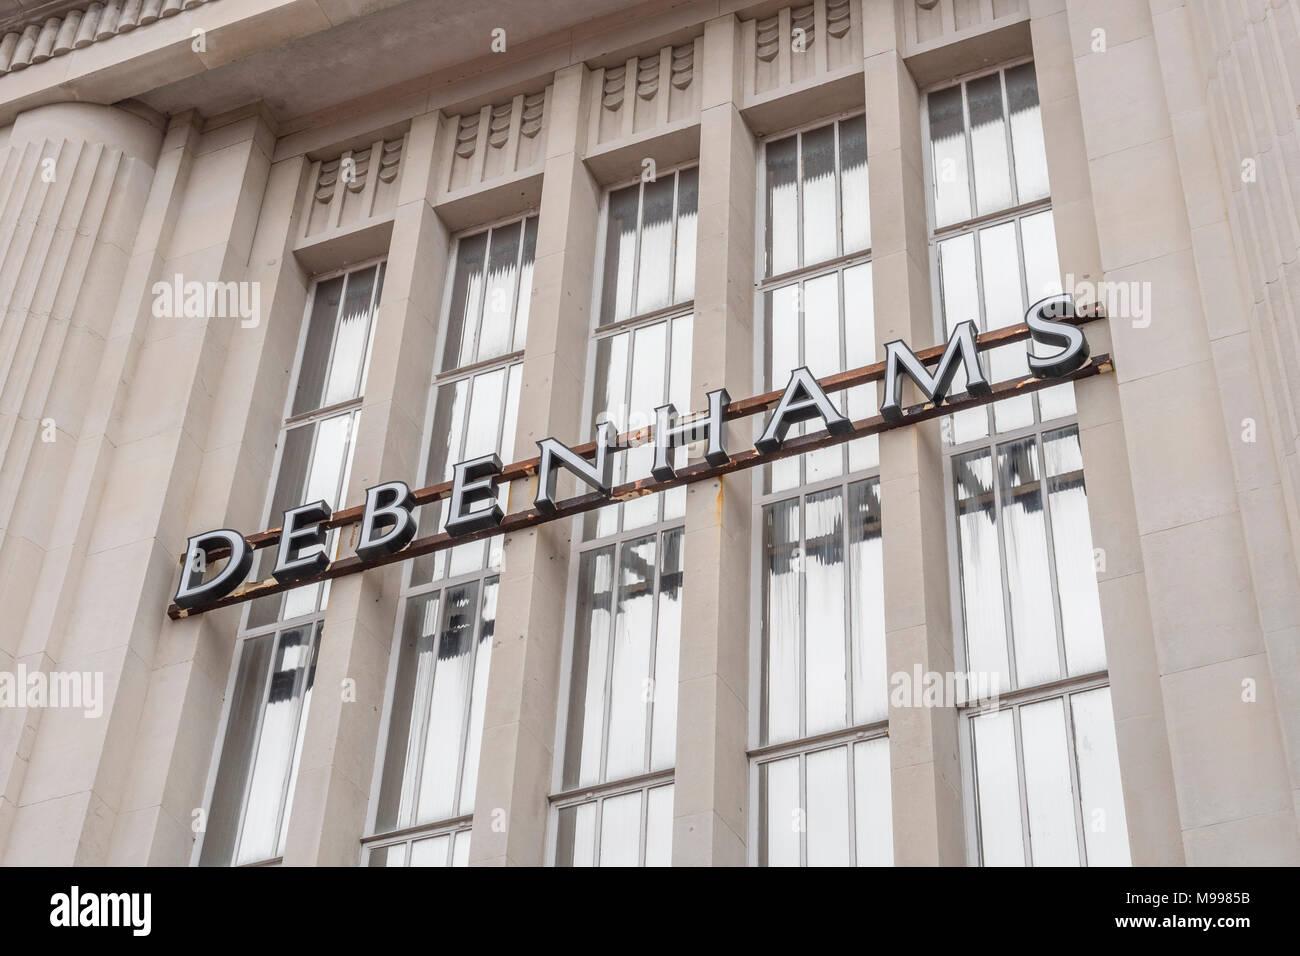 Exterior of Debenhams retail shop in Plymouth with copy space, Devon. Metaphor for 2018 Debenhams profits plunge. - Stock Image